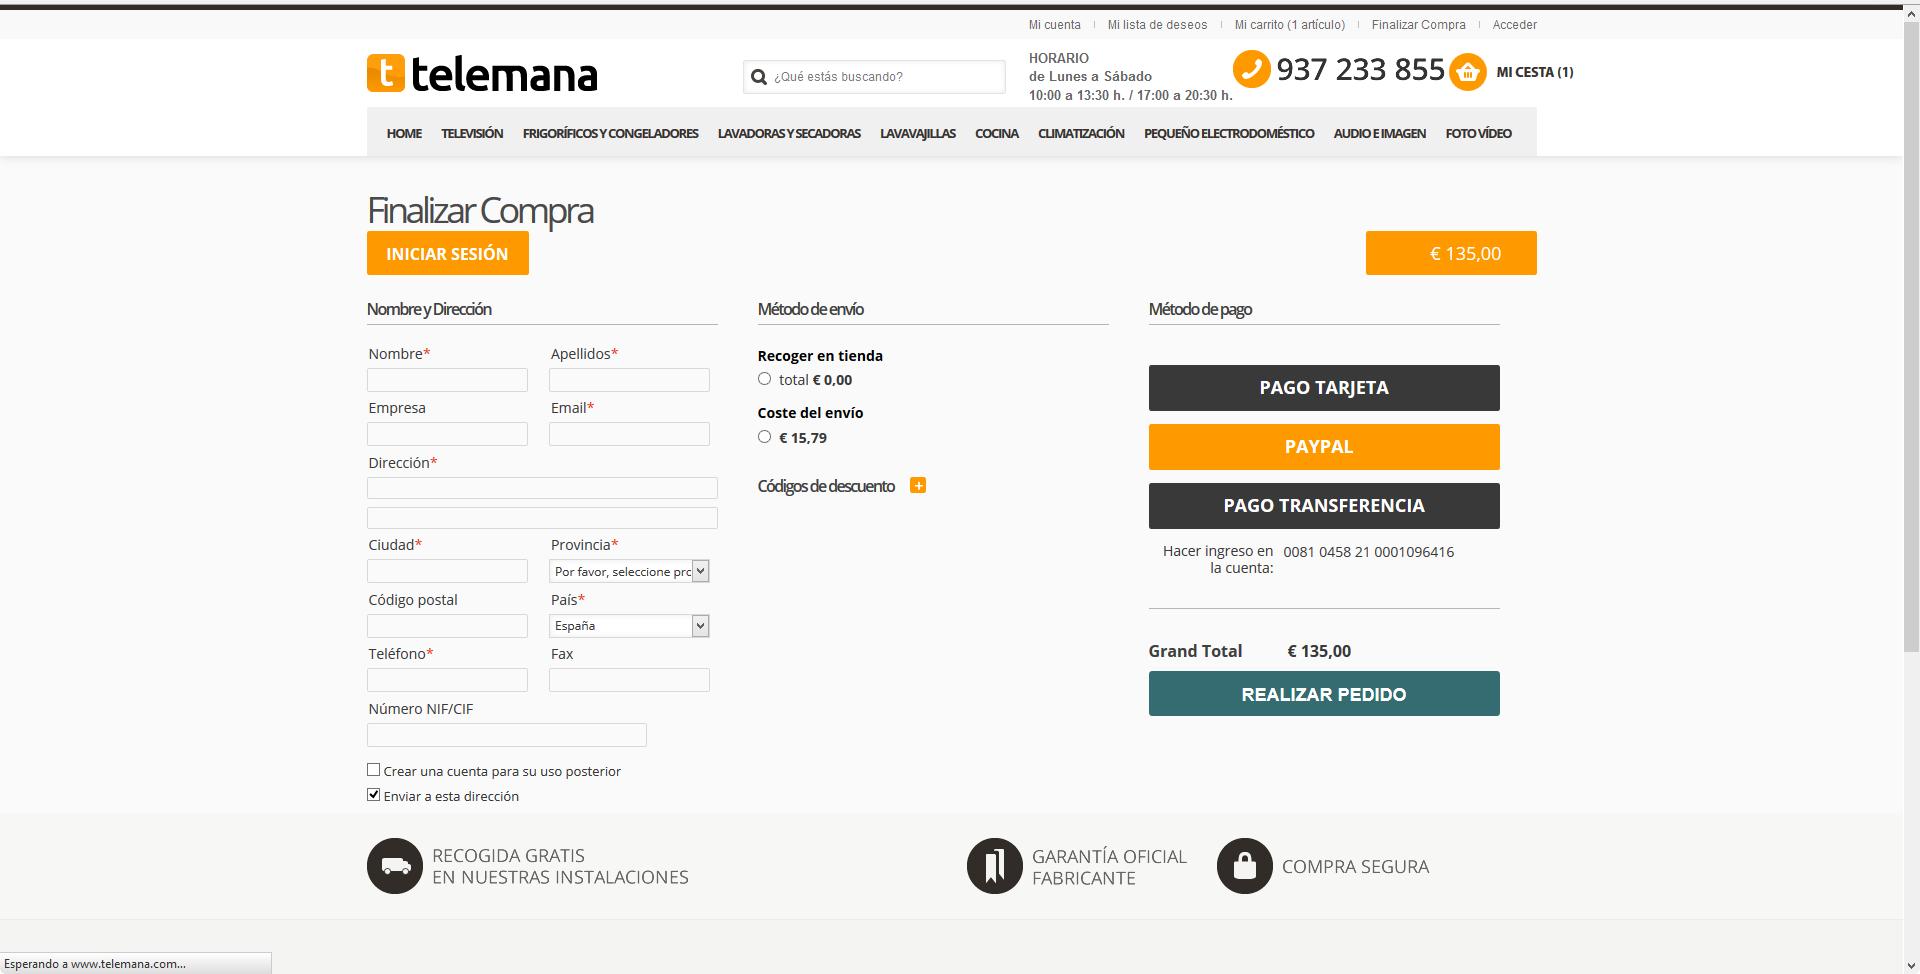 telemana3